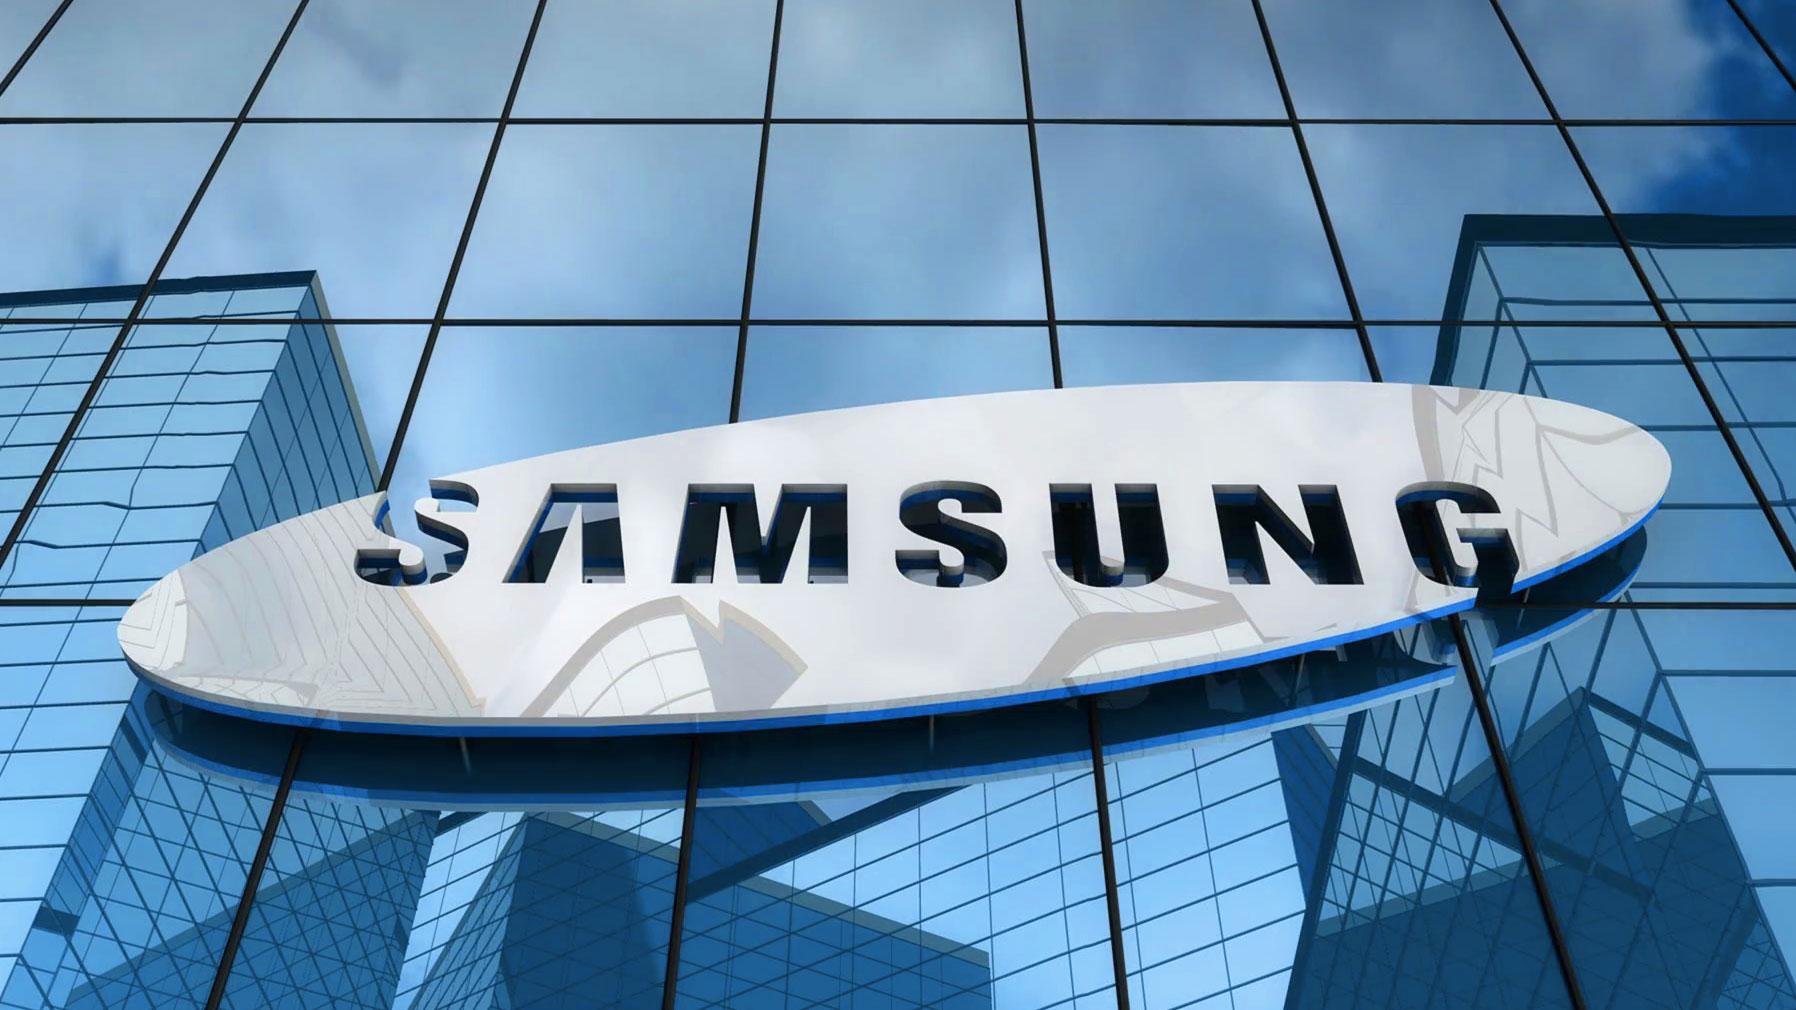 Samsung building - Palazzo a vetri